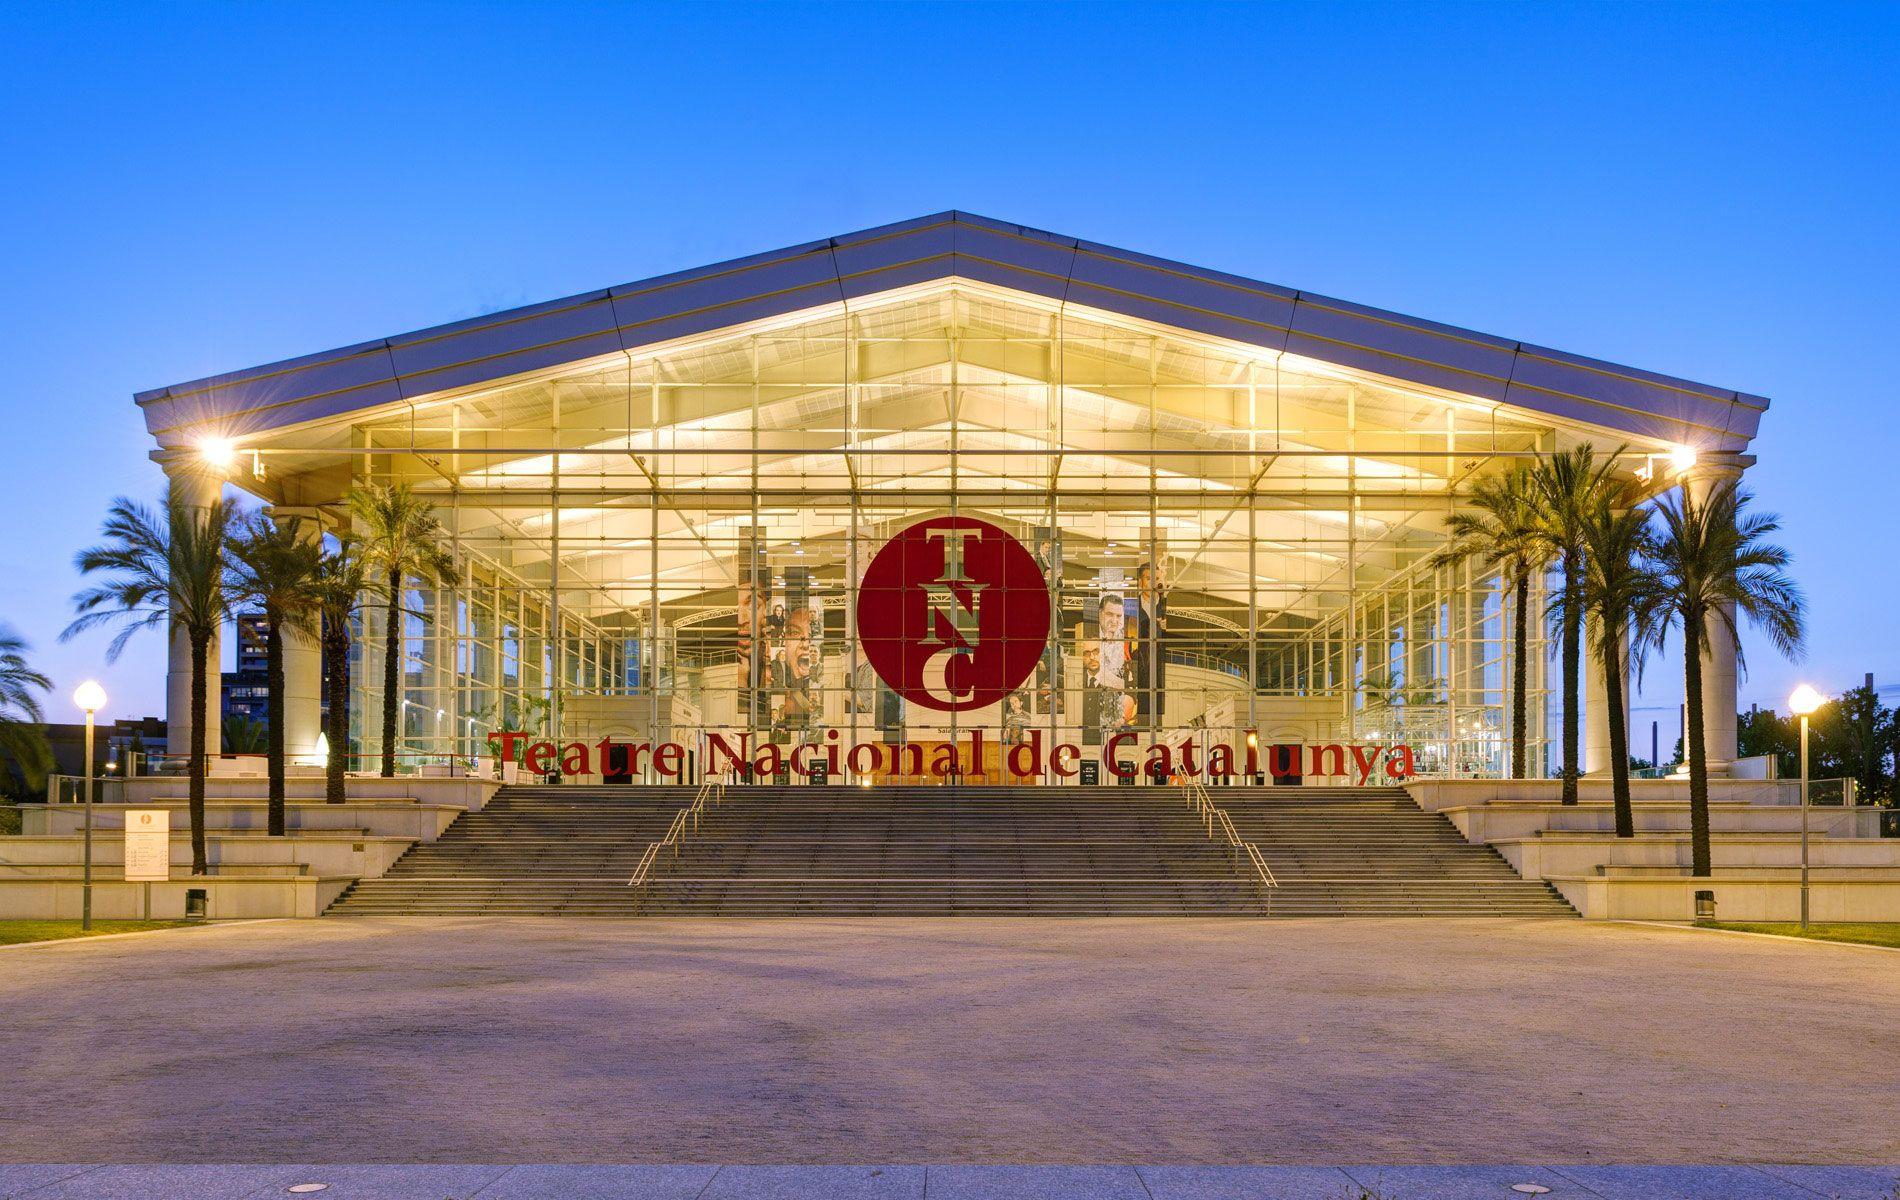 Teatre nacional de catalunya ricardo bofill taller de for Teatre nacional de catalunya